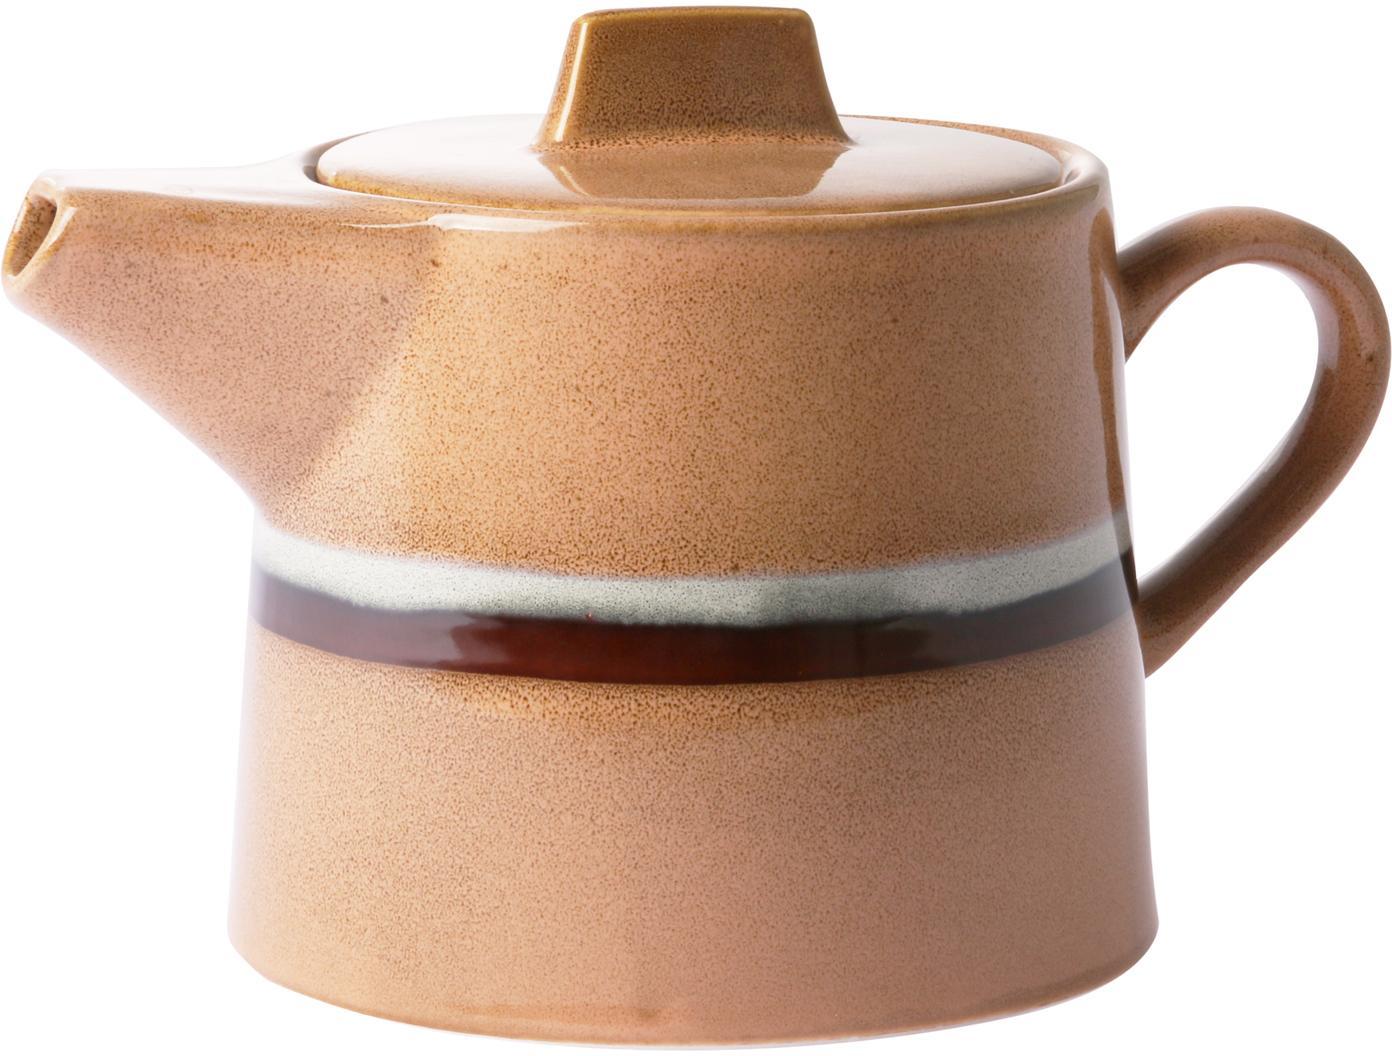 Handgemaakte theepot 70's, Keramiek, Perzikkleurig, Ø 1 x H 2 cm